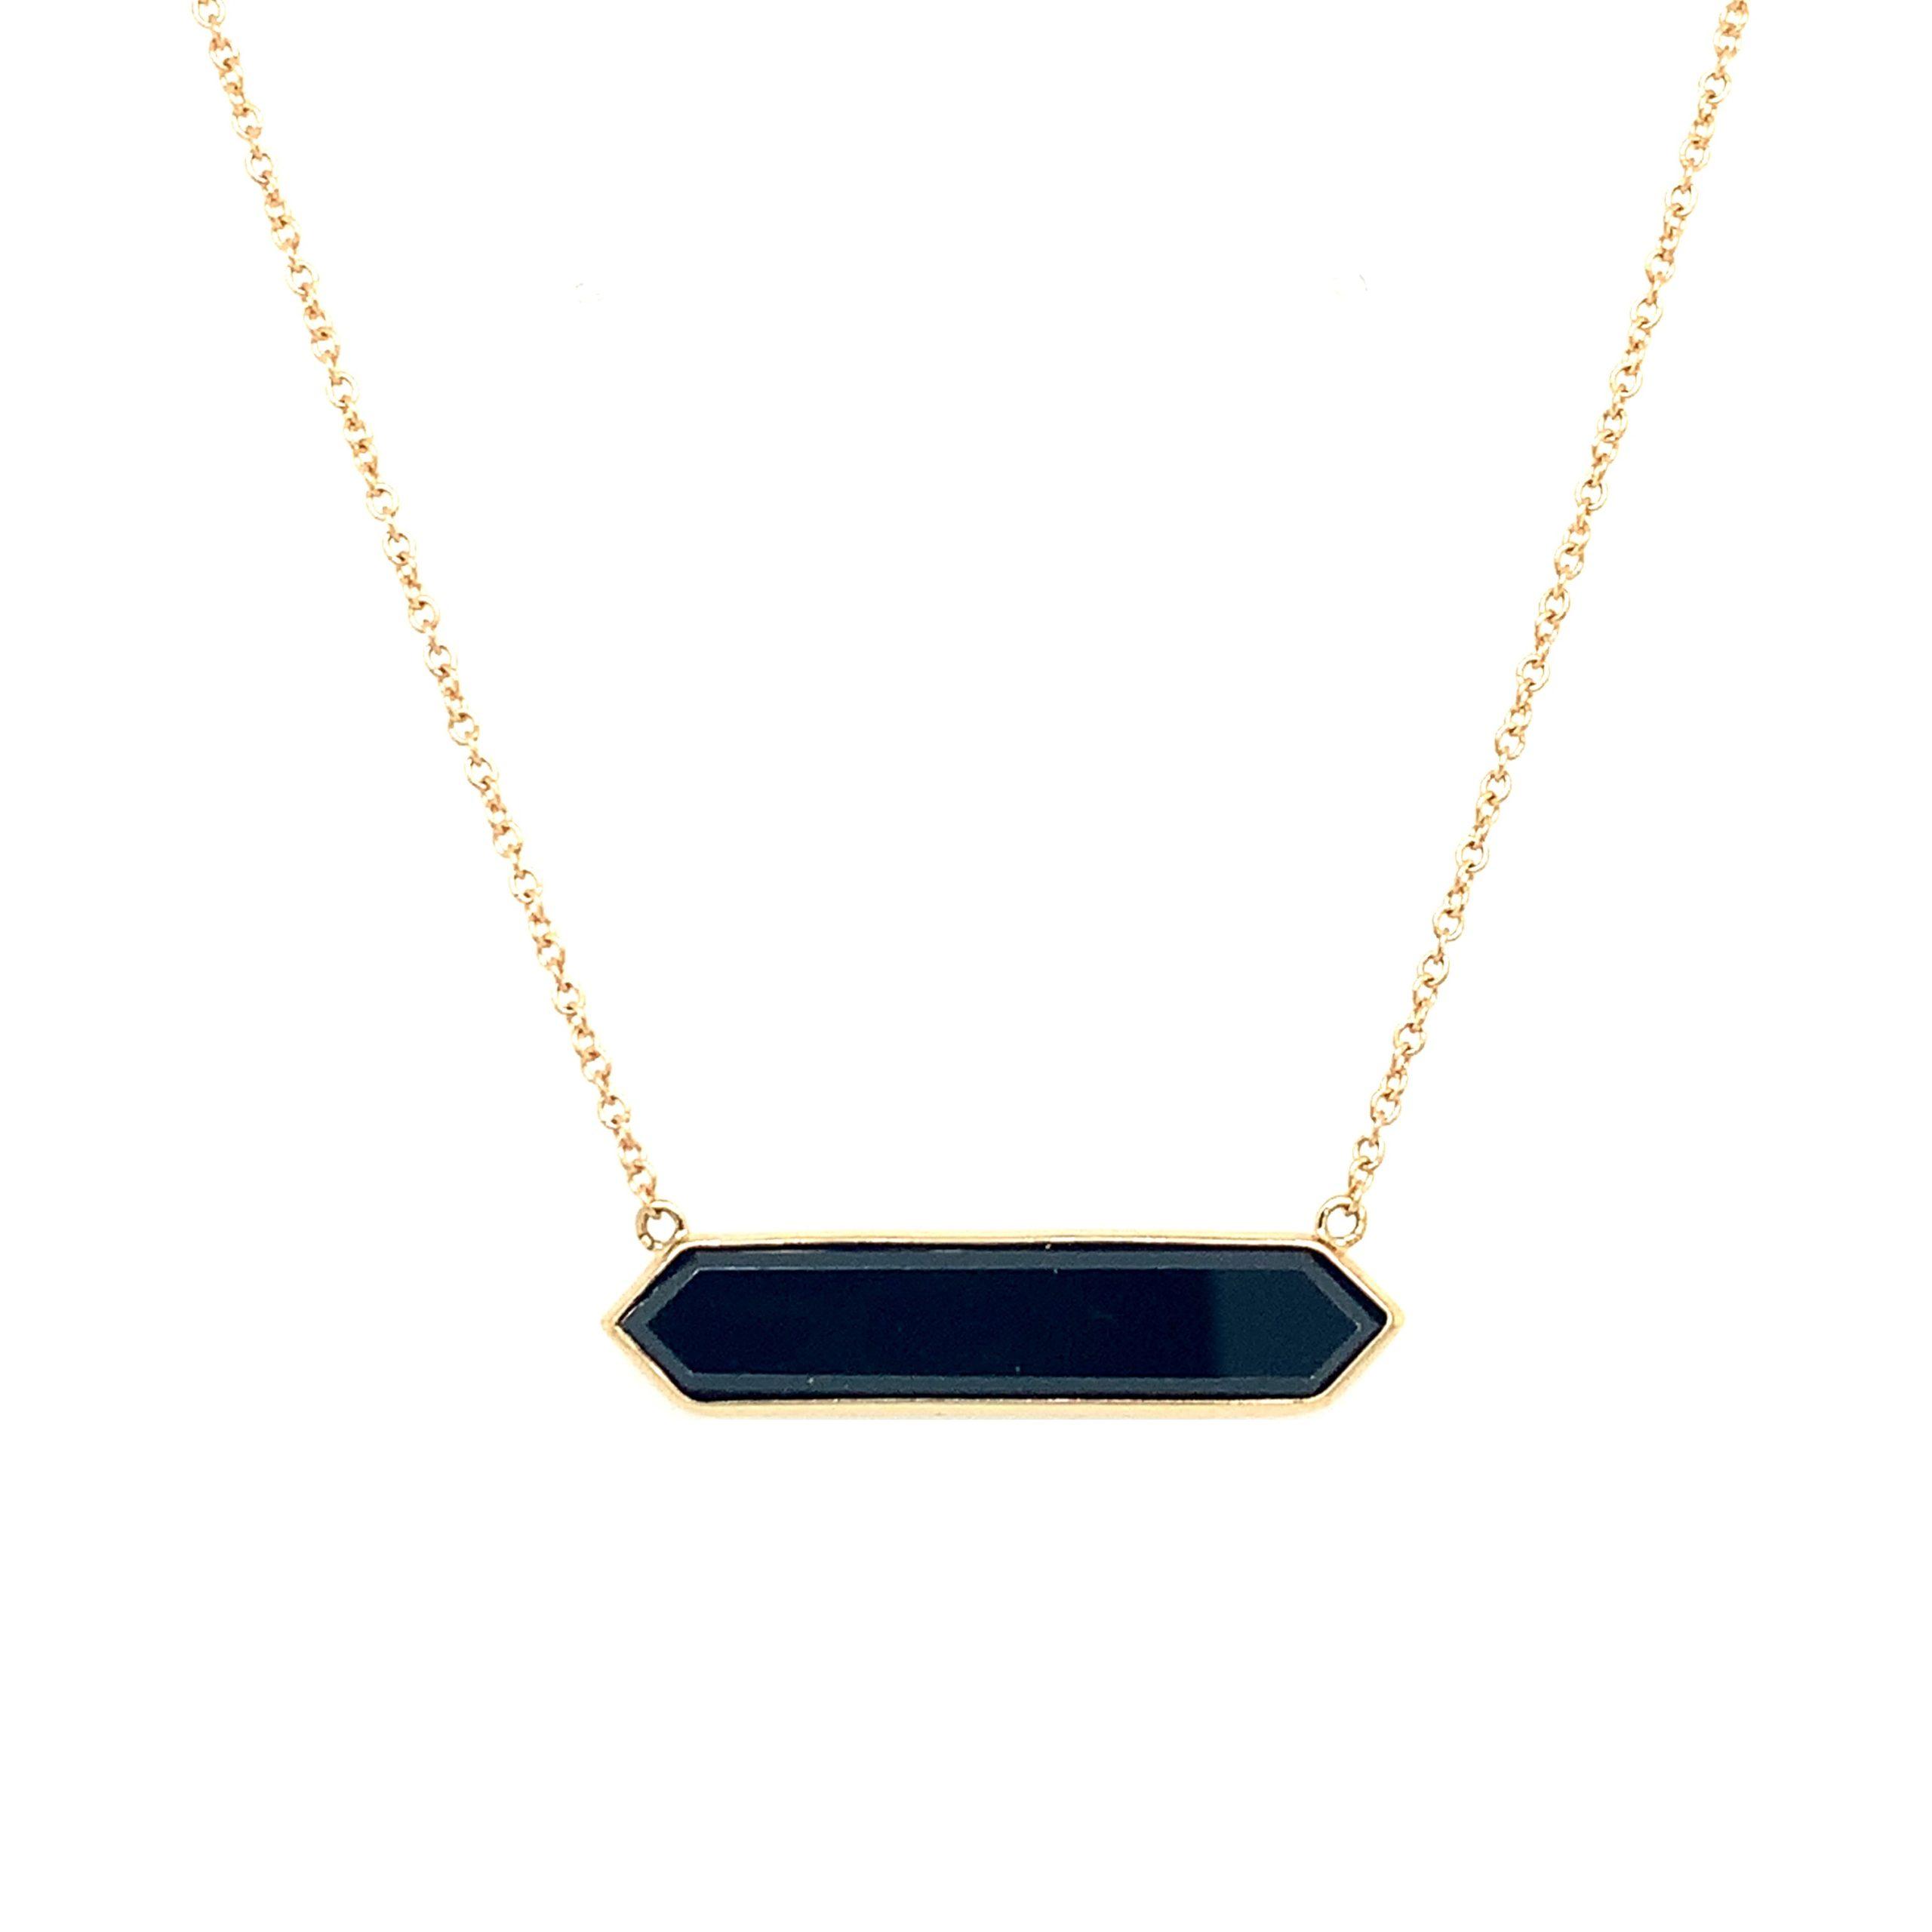 Yellow Gold Hexagonal Onyx Pendant Necklace